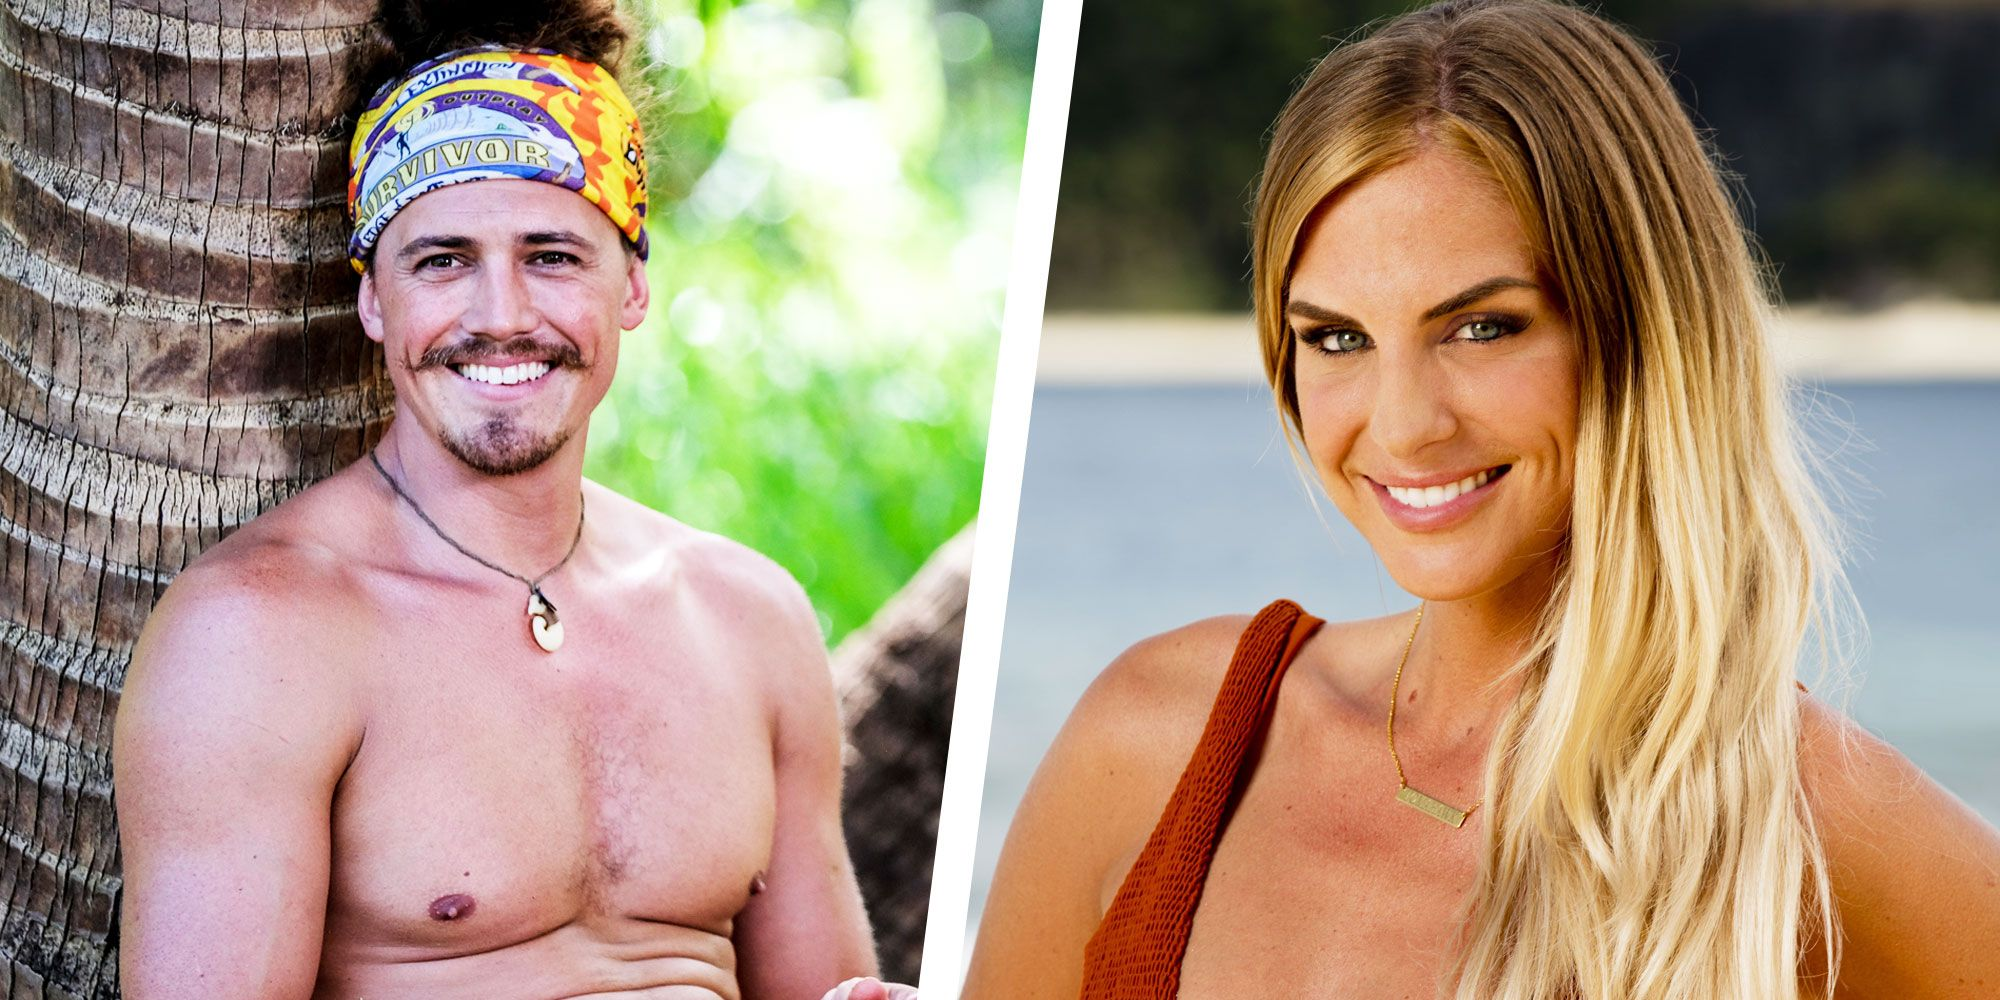 Who Is Joe From Survivor Dating? His Girlfriend Is Sierra